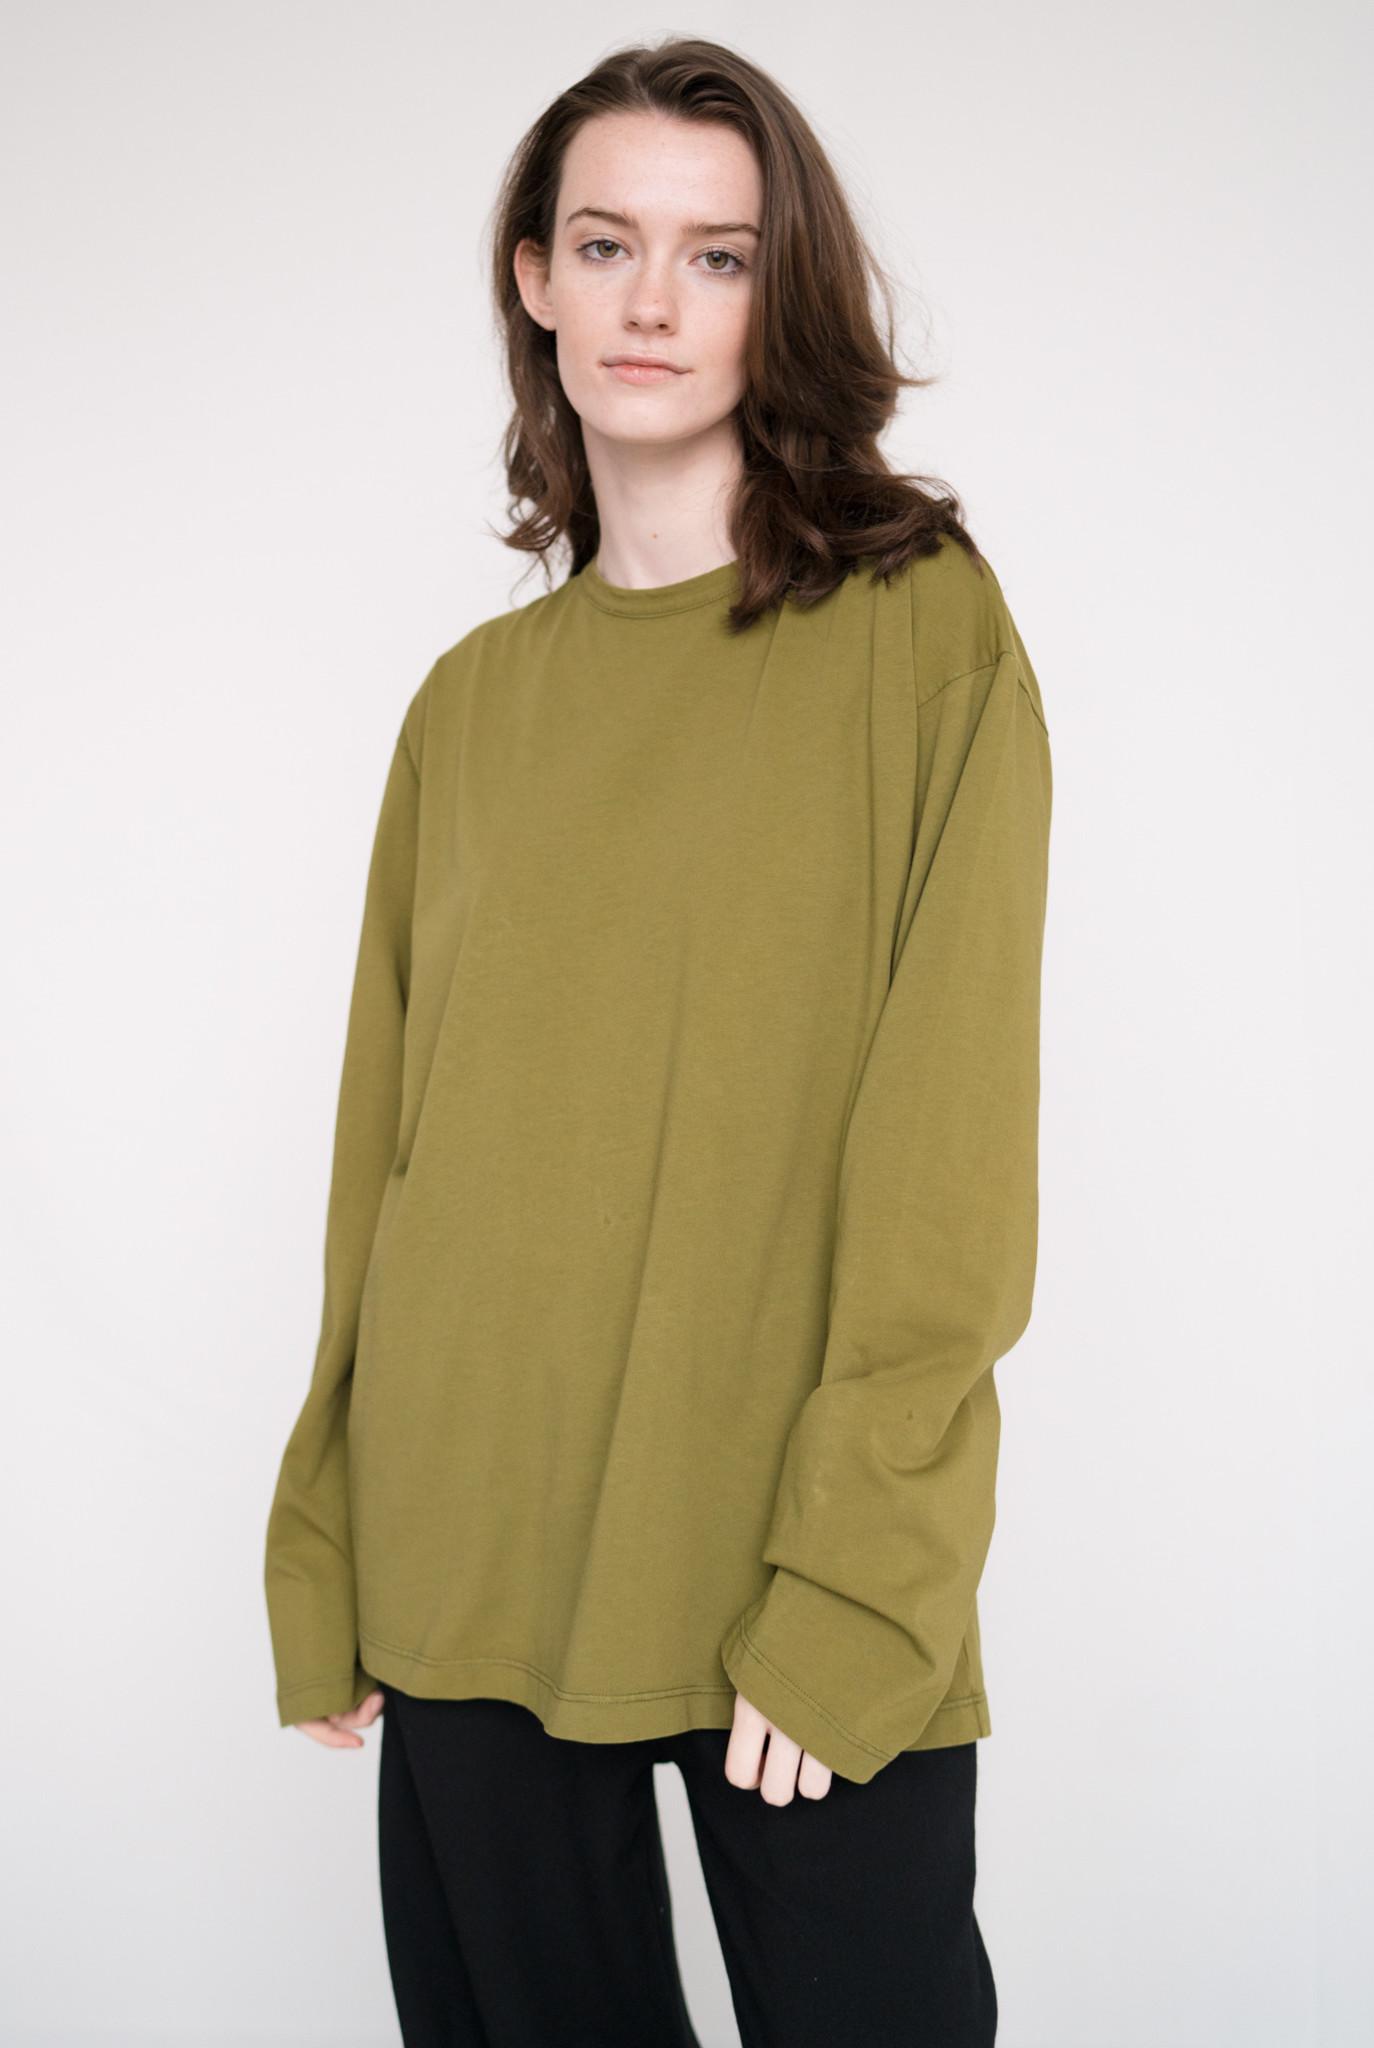 Unisex t-shirt L/S Avocado